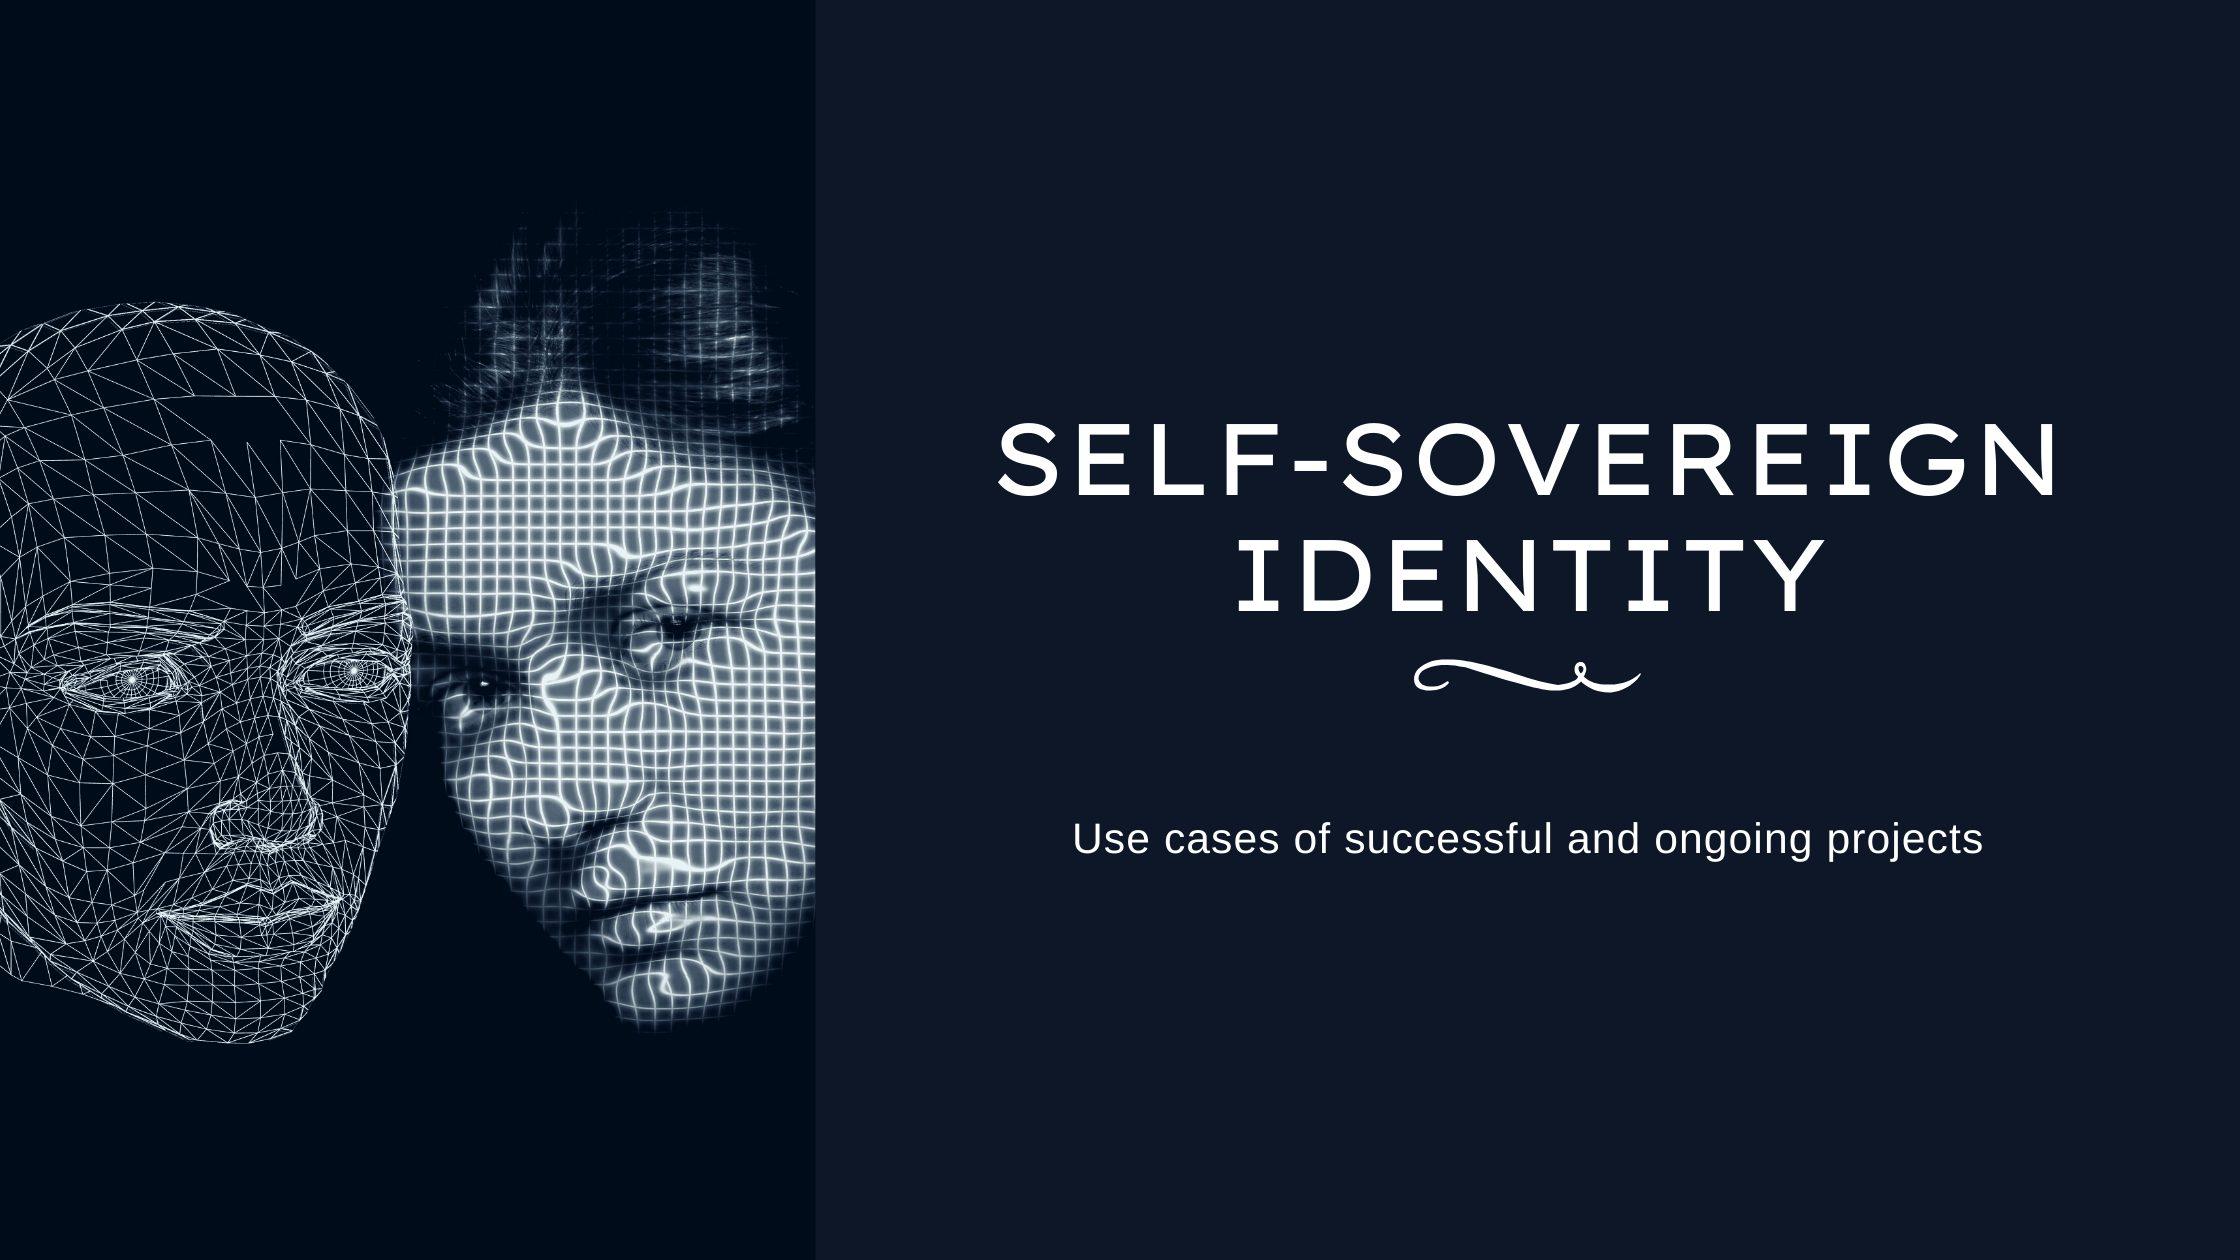 self-sovereign identity